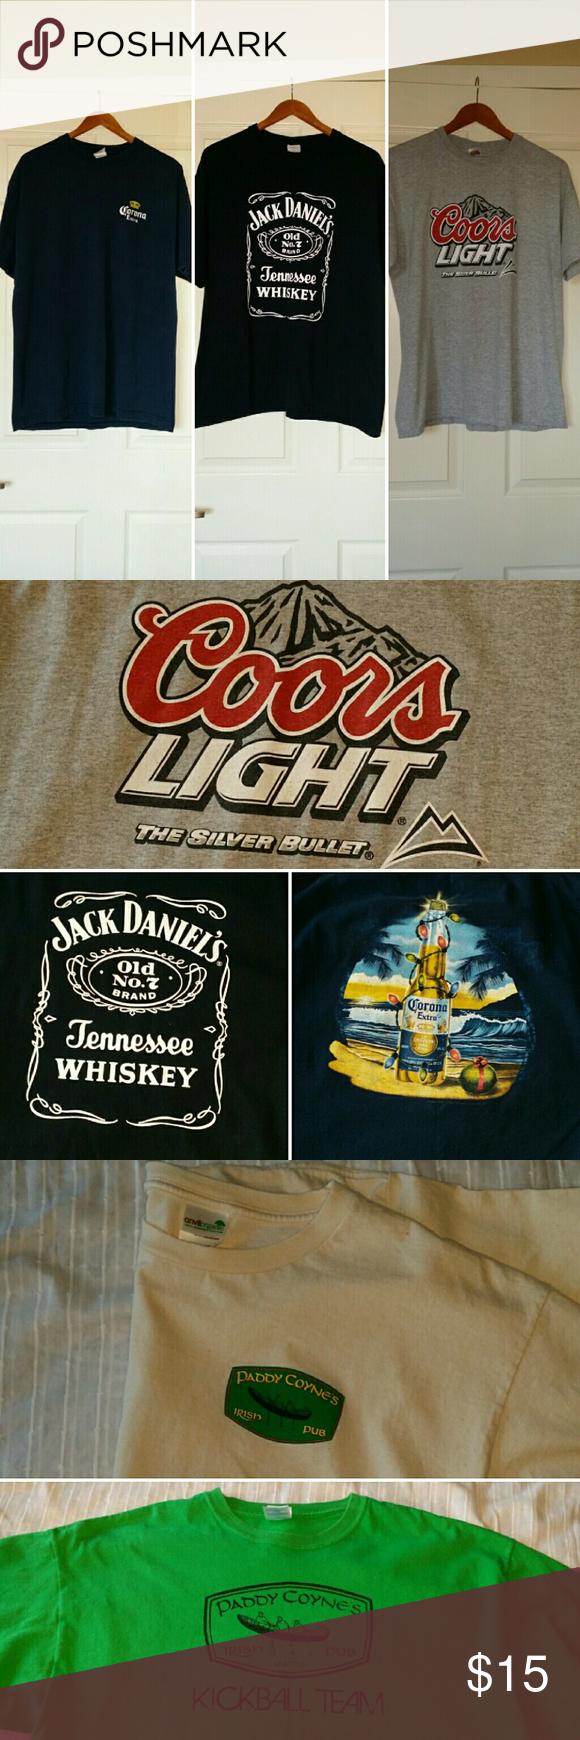 5 Tee Bundle Corona (navy blue) Coors Lt (light gray) Jack Daniels (black) 2 Paddy Coyne's Irish Pub t-shirts (cream & bright green)  All XL & cotton, great condition! Shirts Tees - Short Sleeve